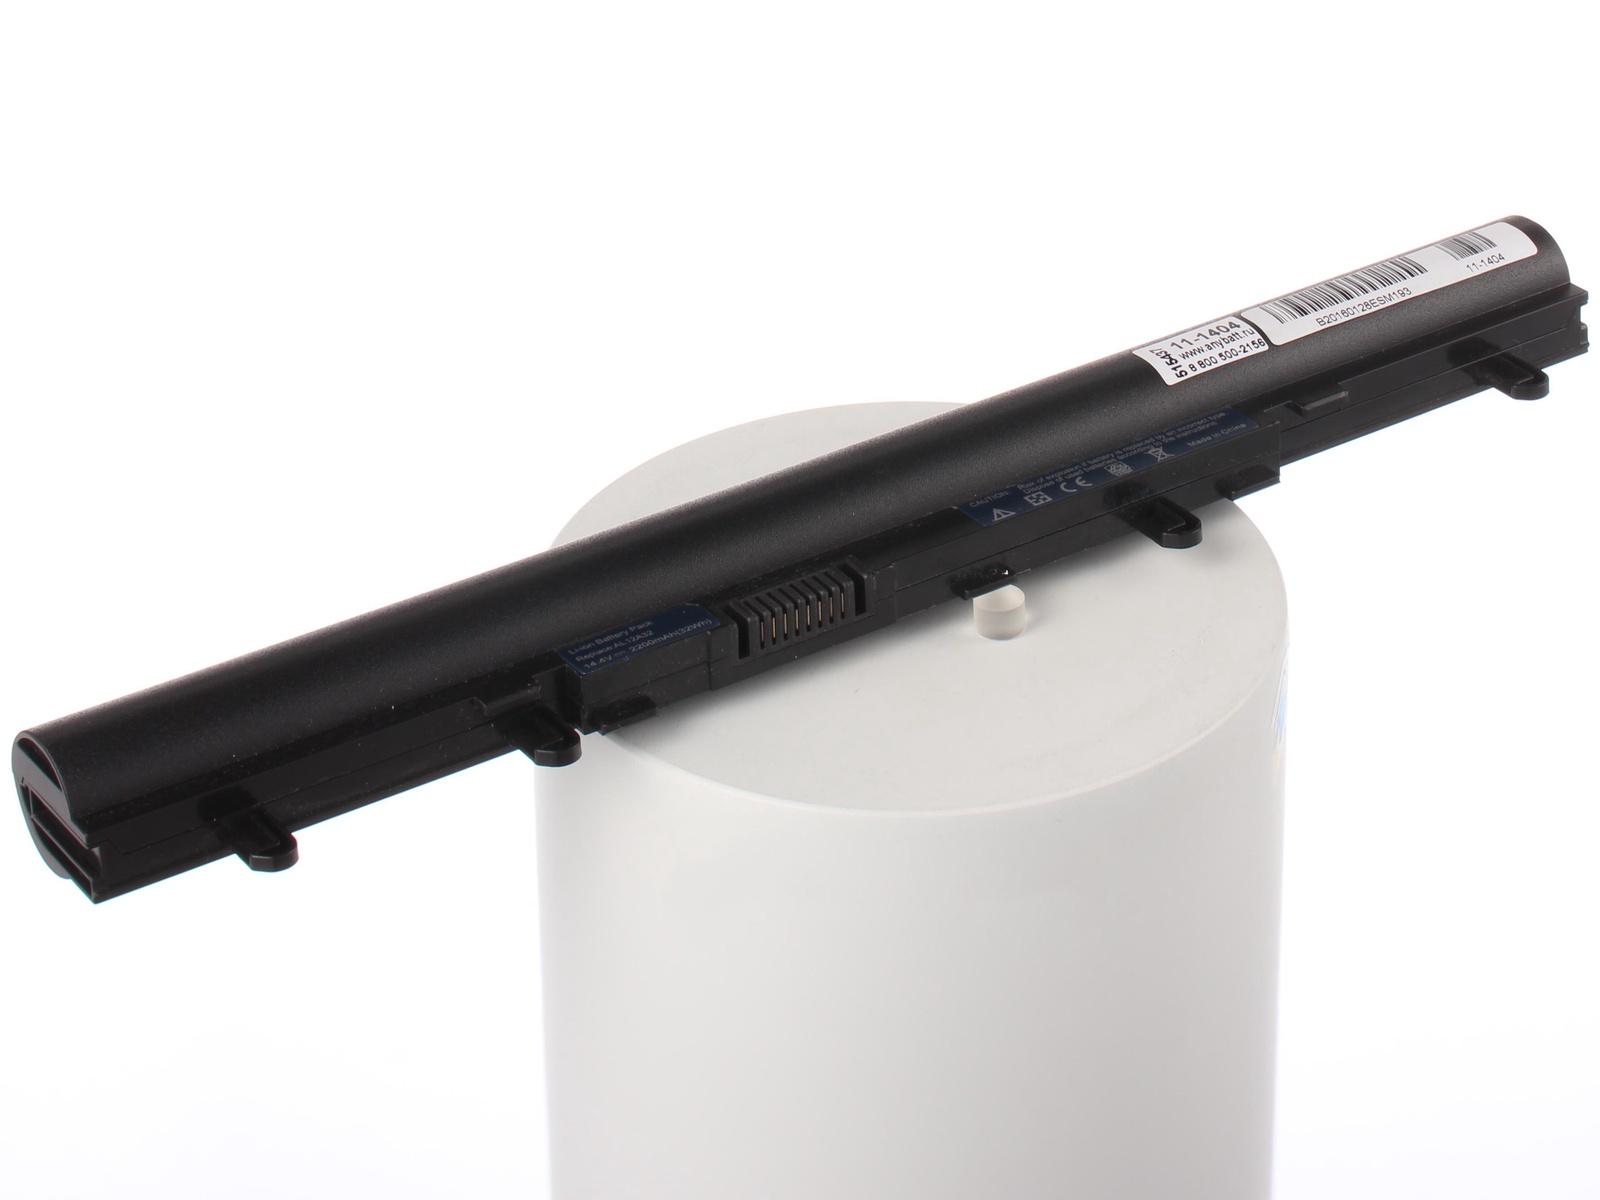 Аккумулятор для ноутбука AnyBatt для Acer Aspire E1-572G-54204G50Mn, Aspire E1-572G-54206G1TMnii, Aspire E1-572G-54206G1TMnkk, Aspire V5-471G-53334G50Mauu, Aspire V5-531-987B4G50Ma, TRAVELMATE P245 аккумулятор для ноутбука anybatt для acer aspire e1 532g 35584g50mnkk aspire e1 570g 33214g32mnkk aspire v5 571pg 73536g75ma aspire e1 470p 6659 aspire e1 522 12504g50mn aspire e1 522 45004g1tmn aspire e1 570g 33214g50mnii